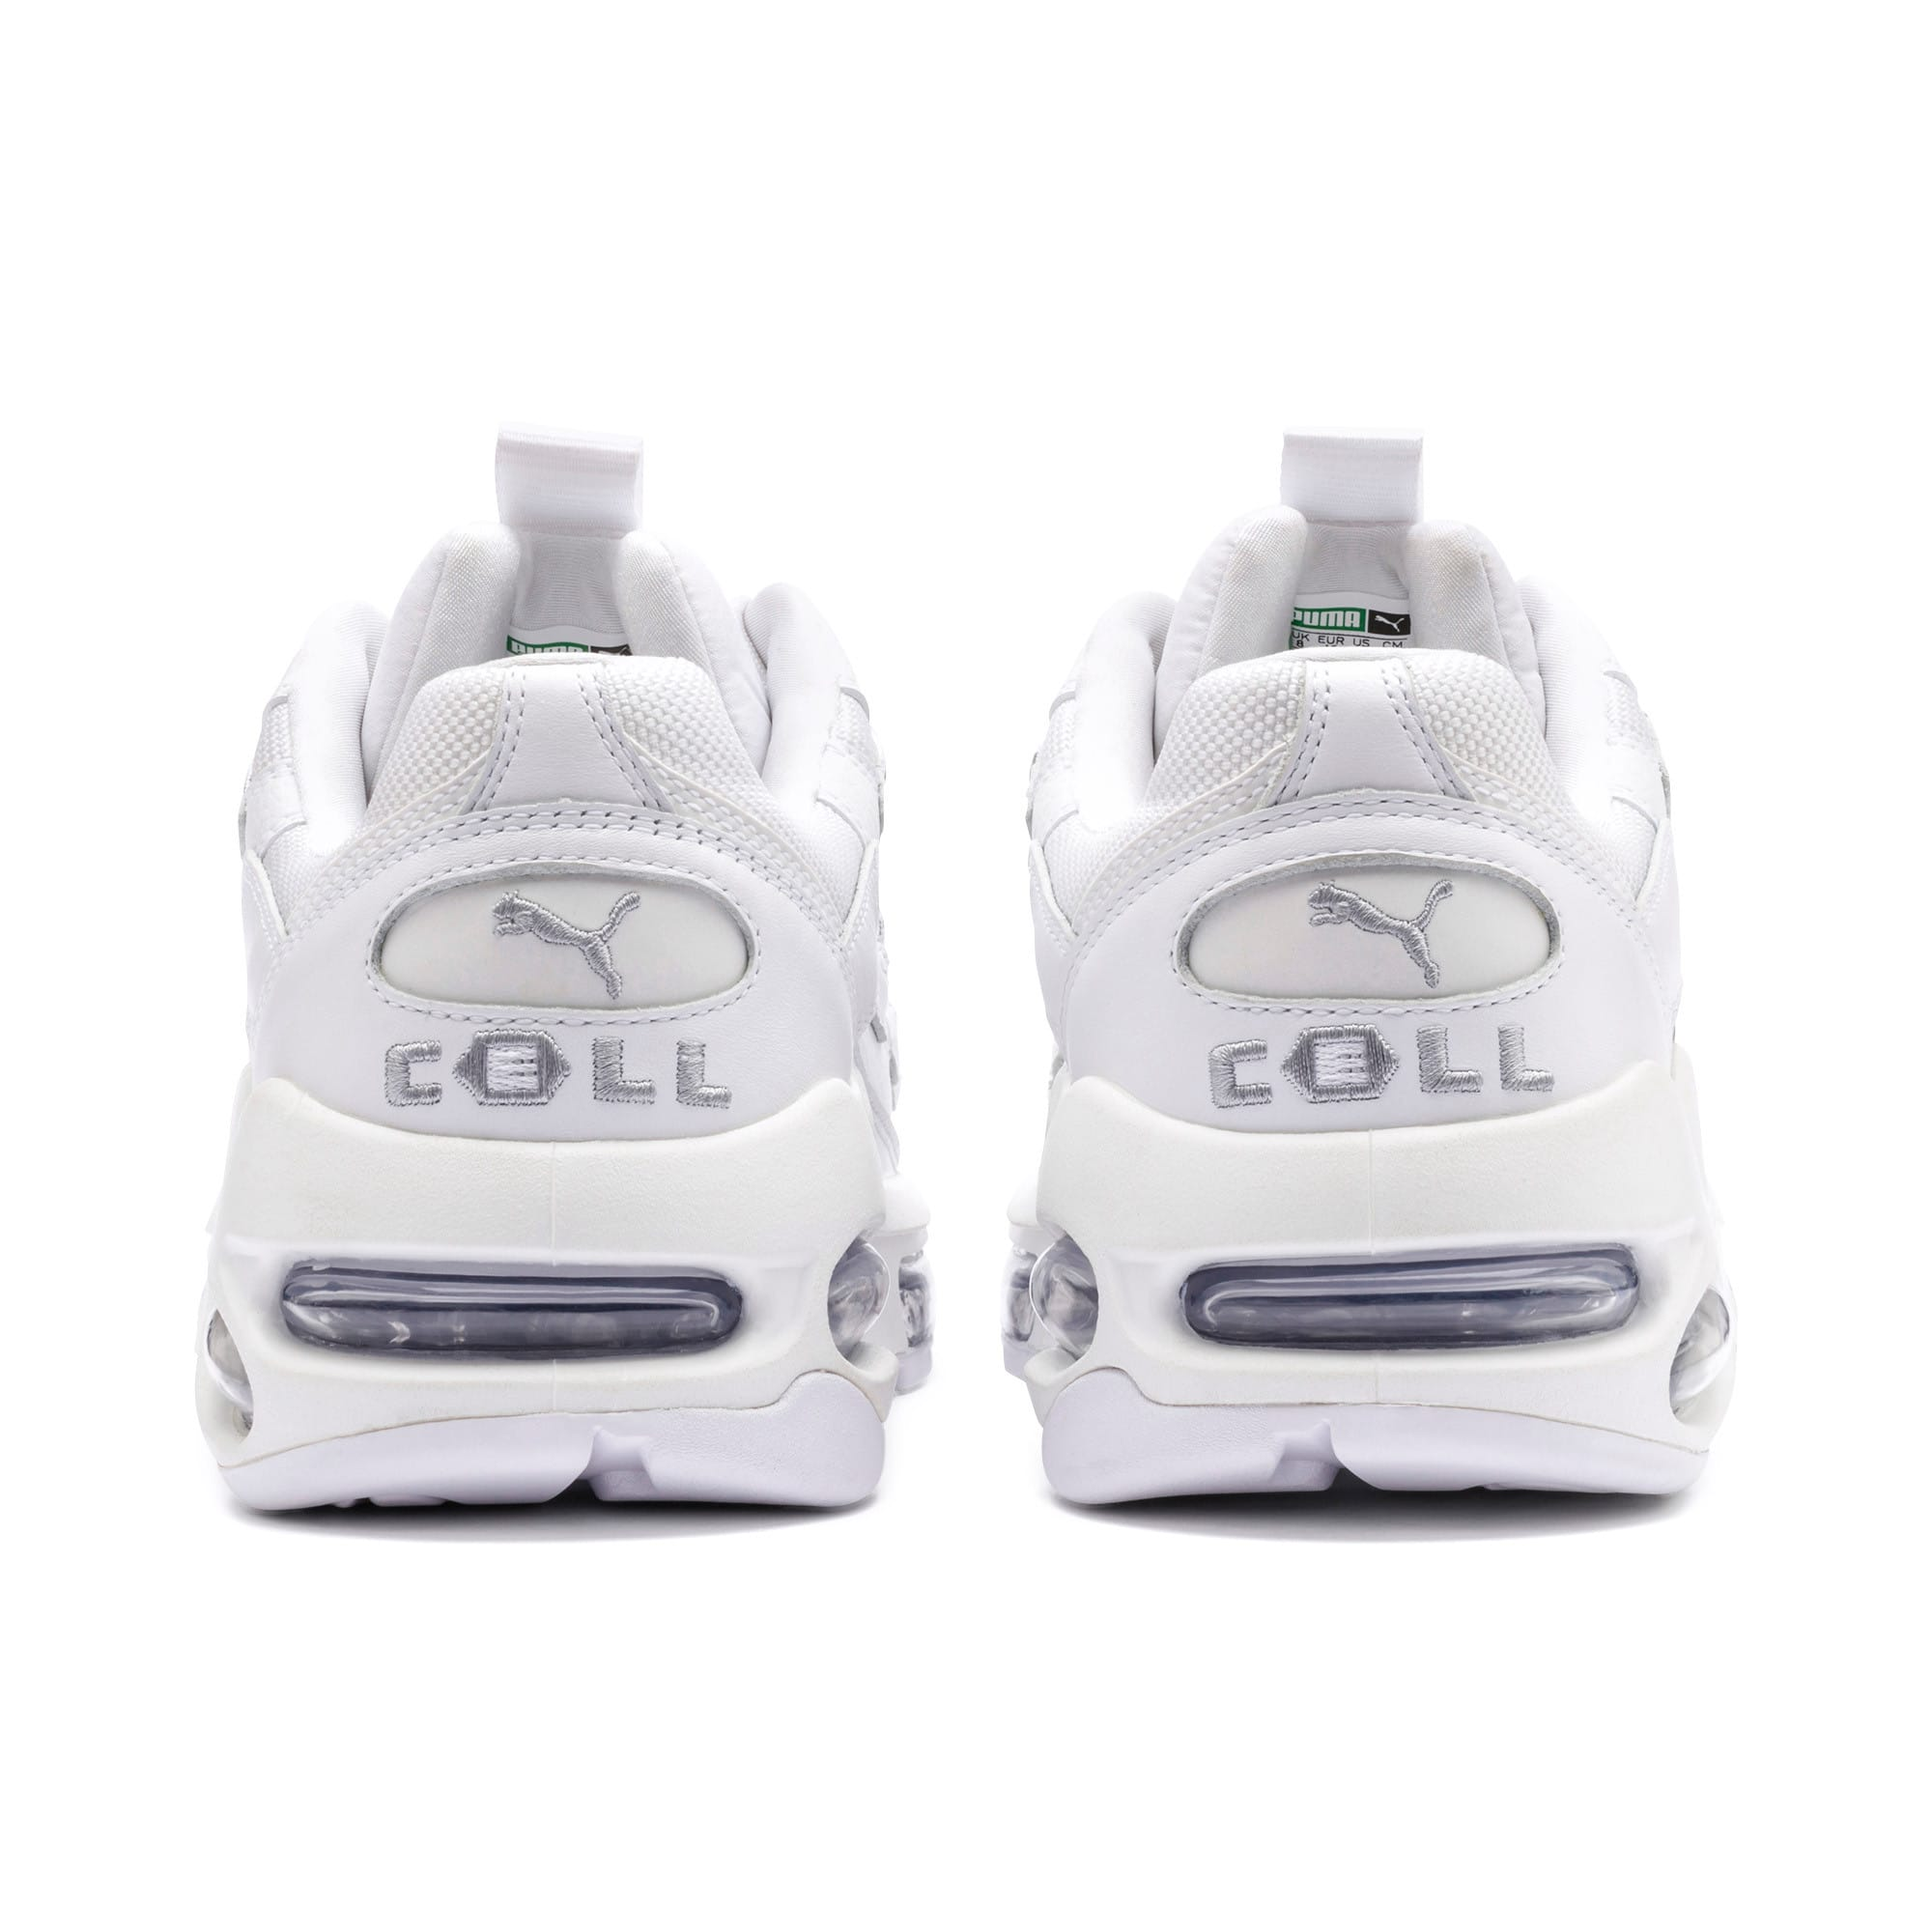 Thumbnail 4 of CELL Endura Rebound Sneaker, Puma White-Puma White, medium